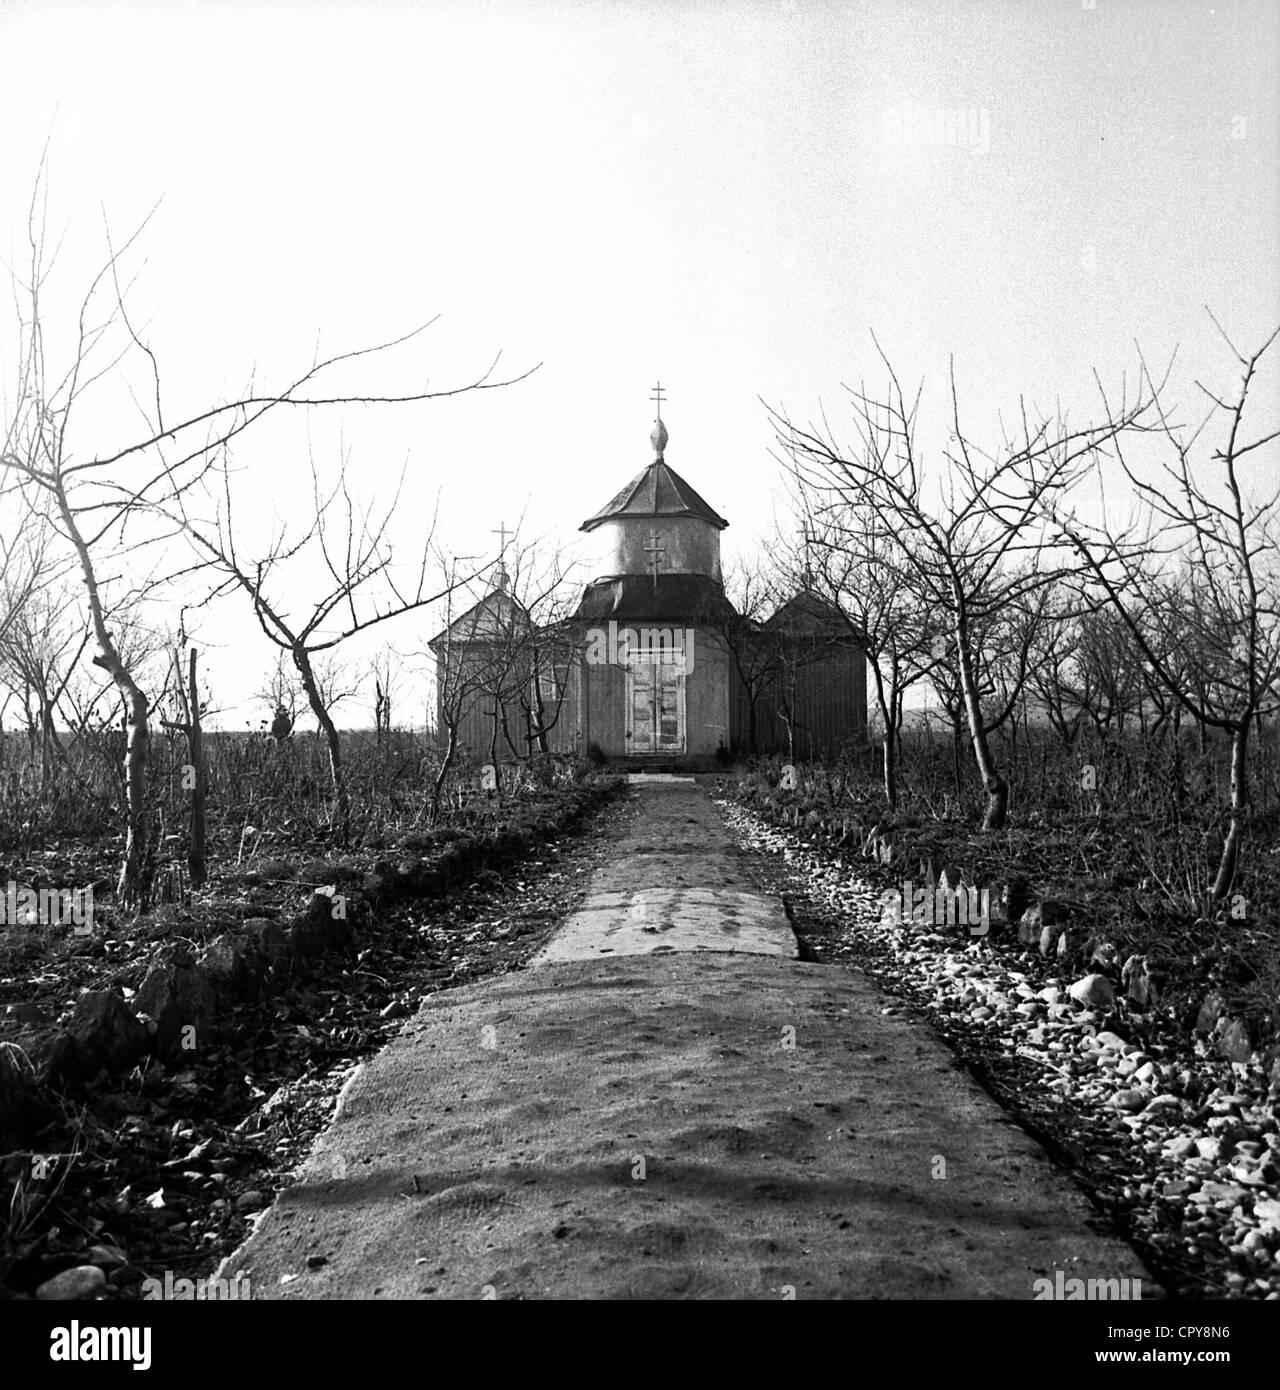 Timofey (born Timofey Vasilevich Prochorov), 22.1.1894 - 13.7.2004, Russian hermit in Munich, Germany, his church - Stock Image